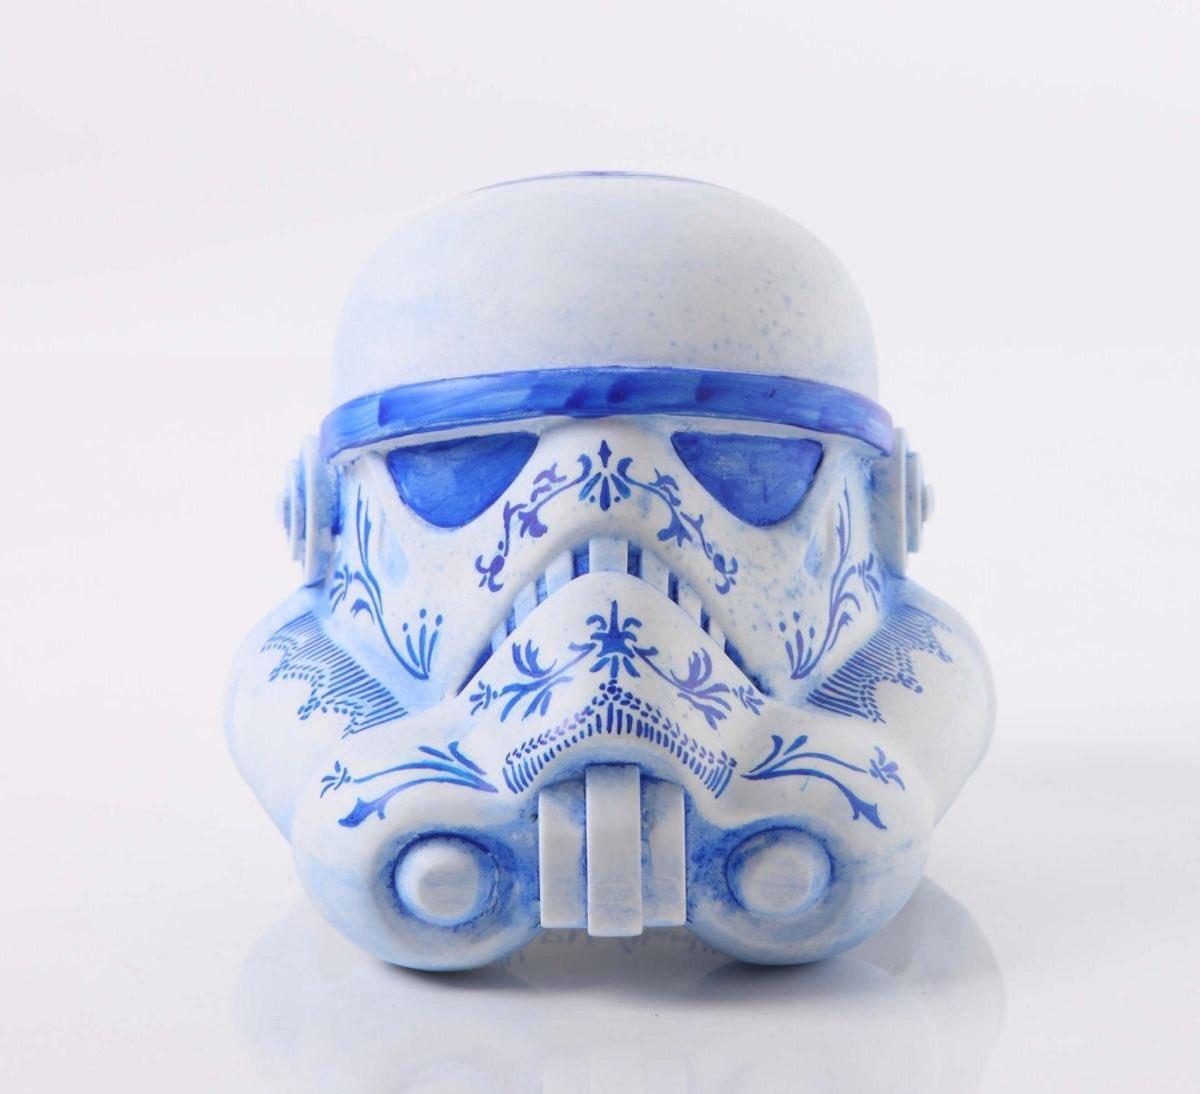 Tea time for stormtroopers!!!!  #stormtrooper #StarWars #teatime #tea<br>http://pic.twitter.com/6V9KTa7OSH